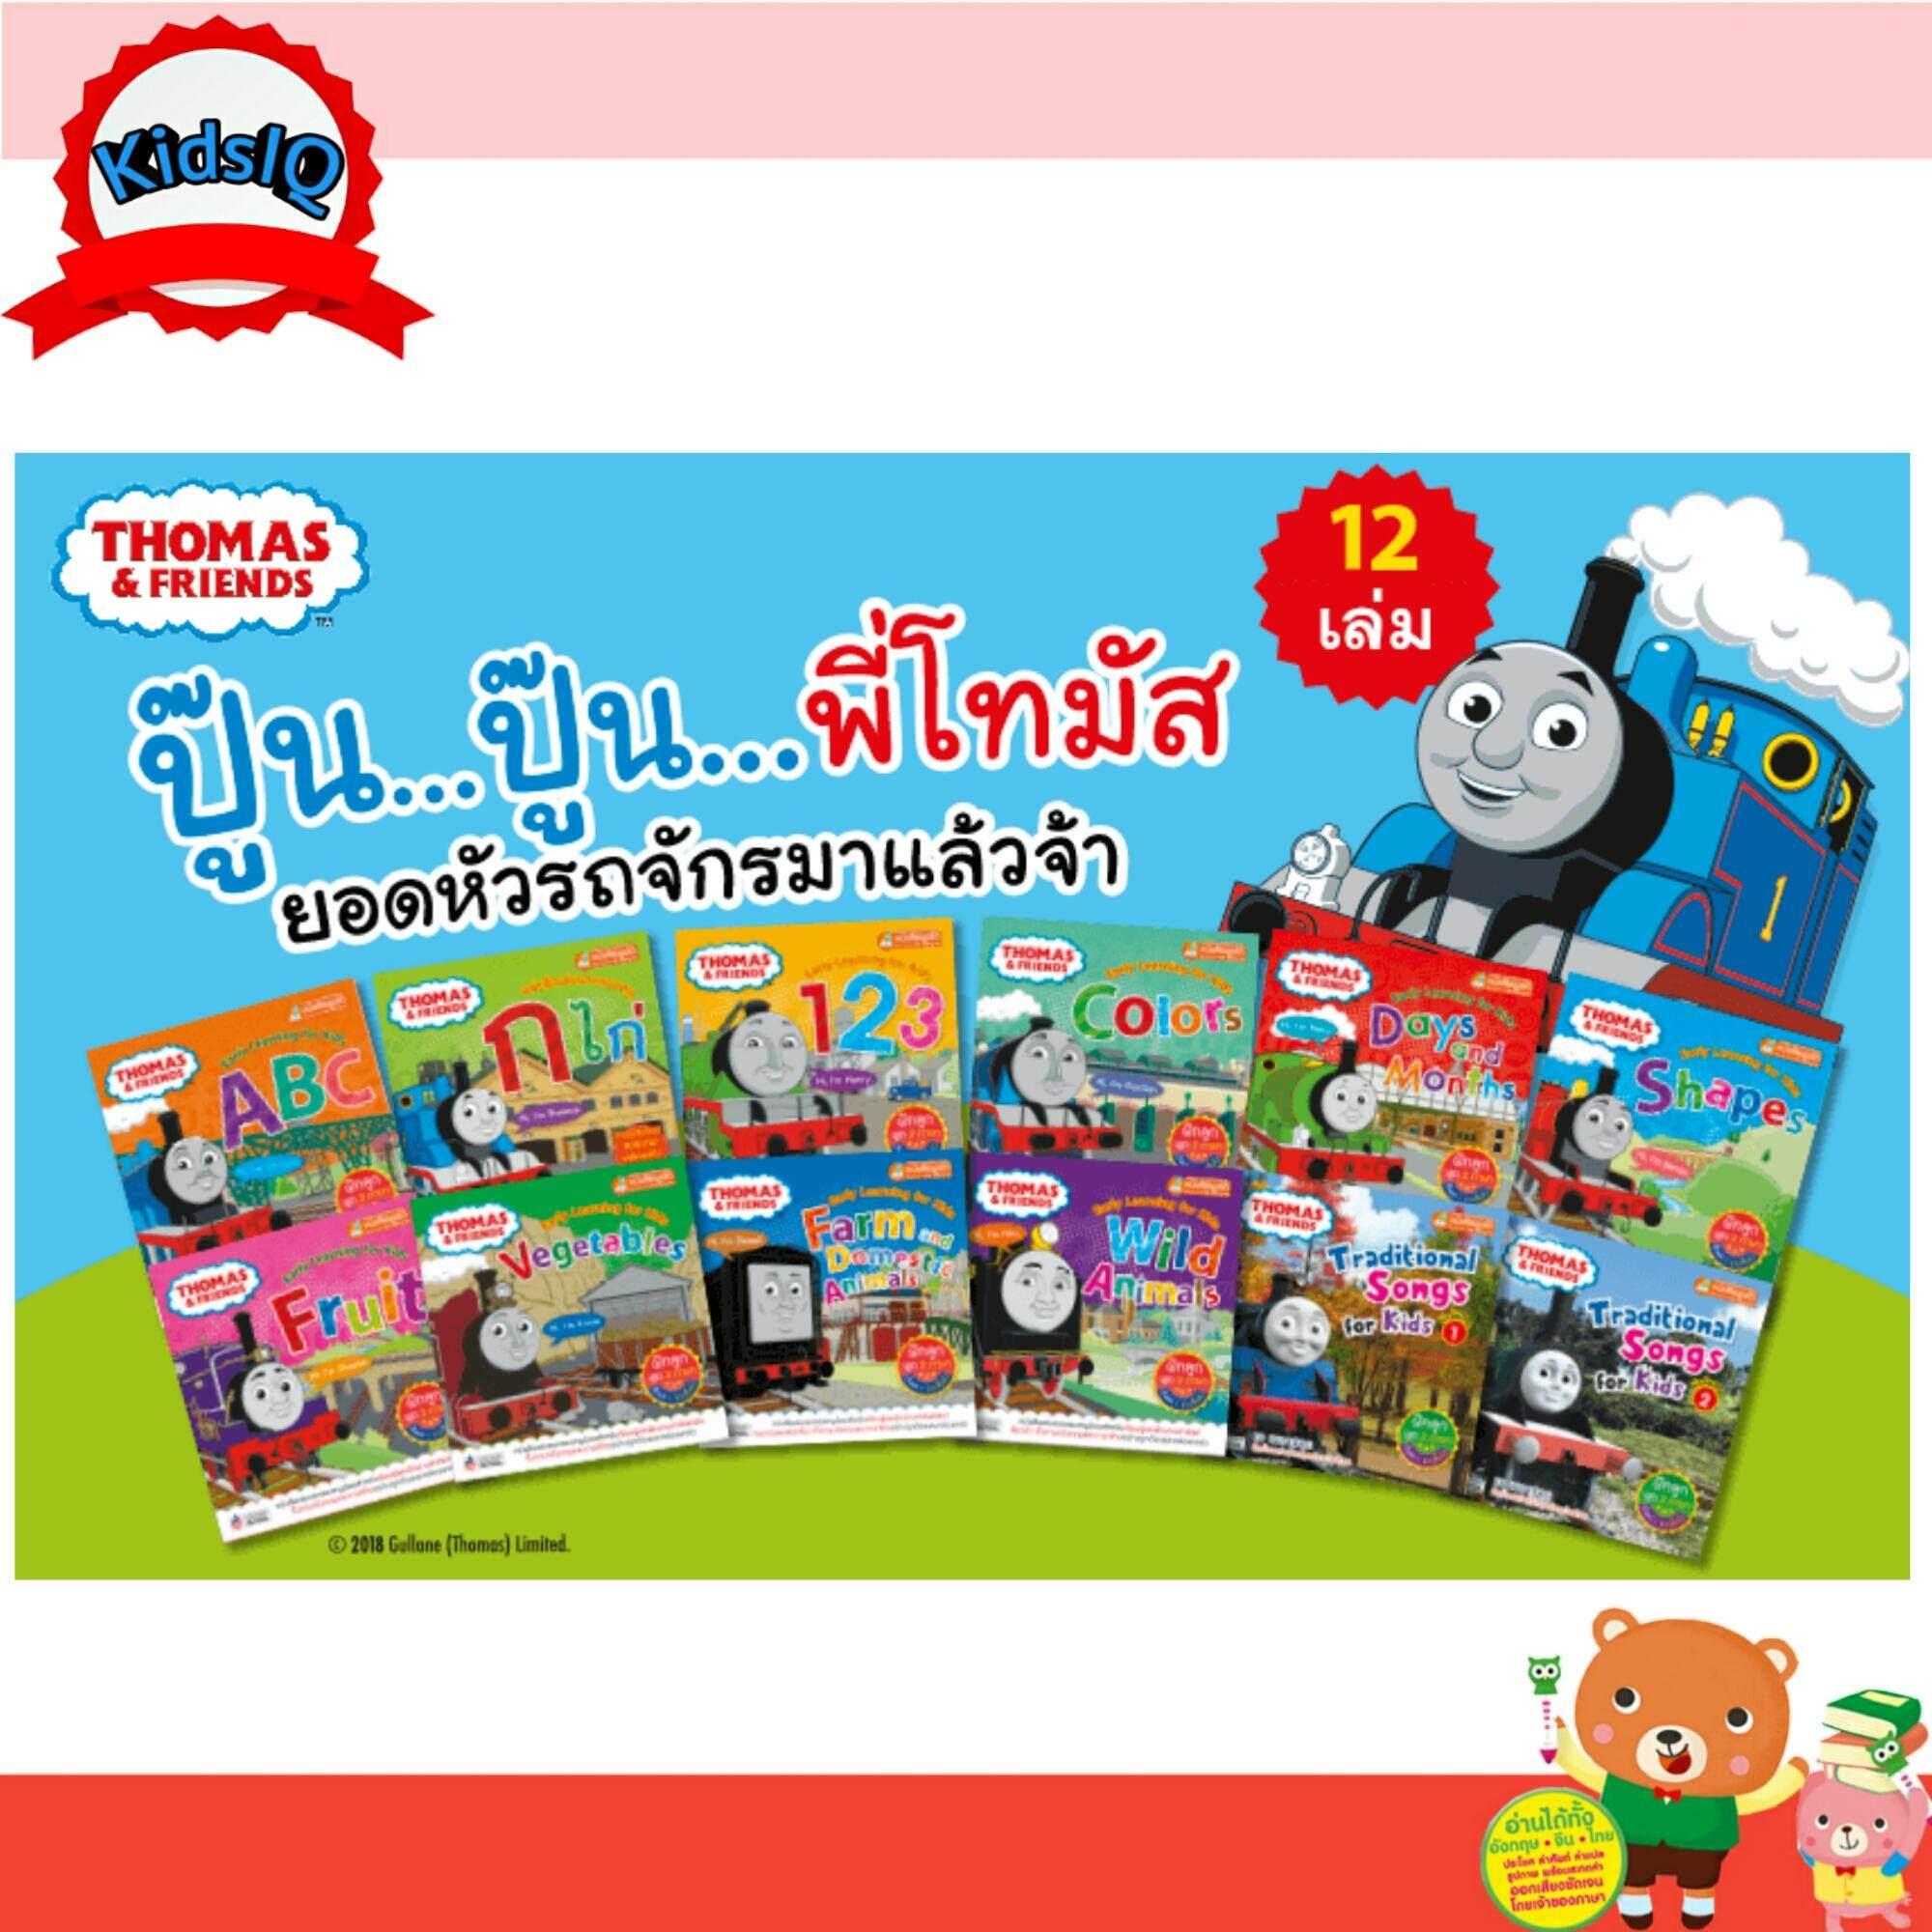 Misbook หนังสือชุดโทมัสสอนหนูเก่งพยัญชนะไทย ตัวอักษรภาษาอังกฤษ ตัวเลขและจำนวนนับ By Kidsiq.